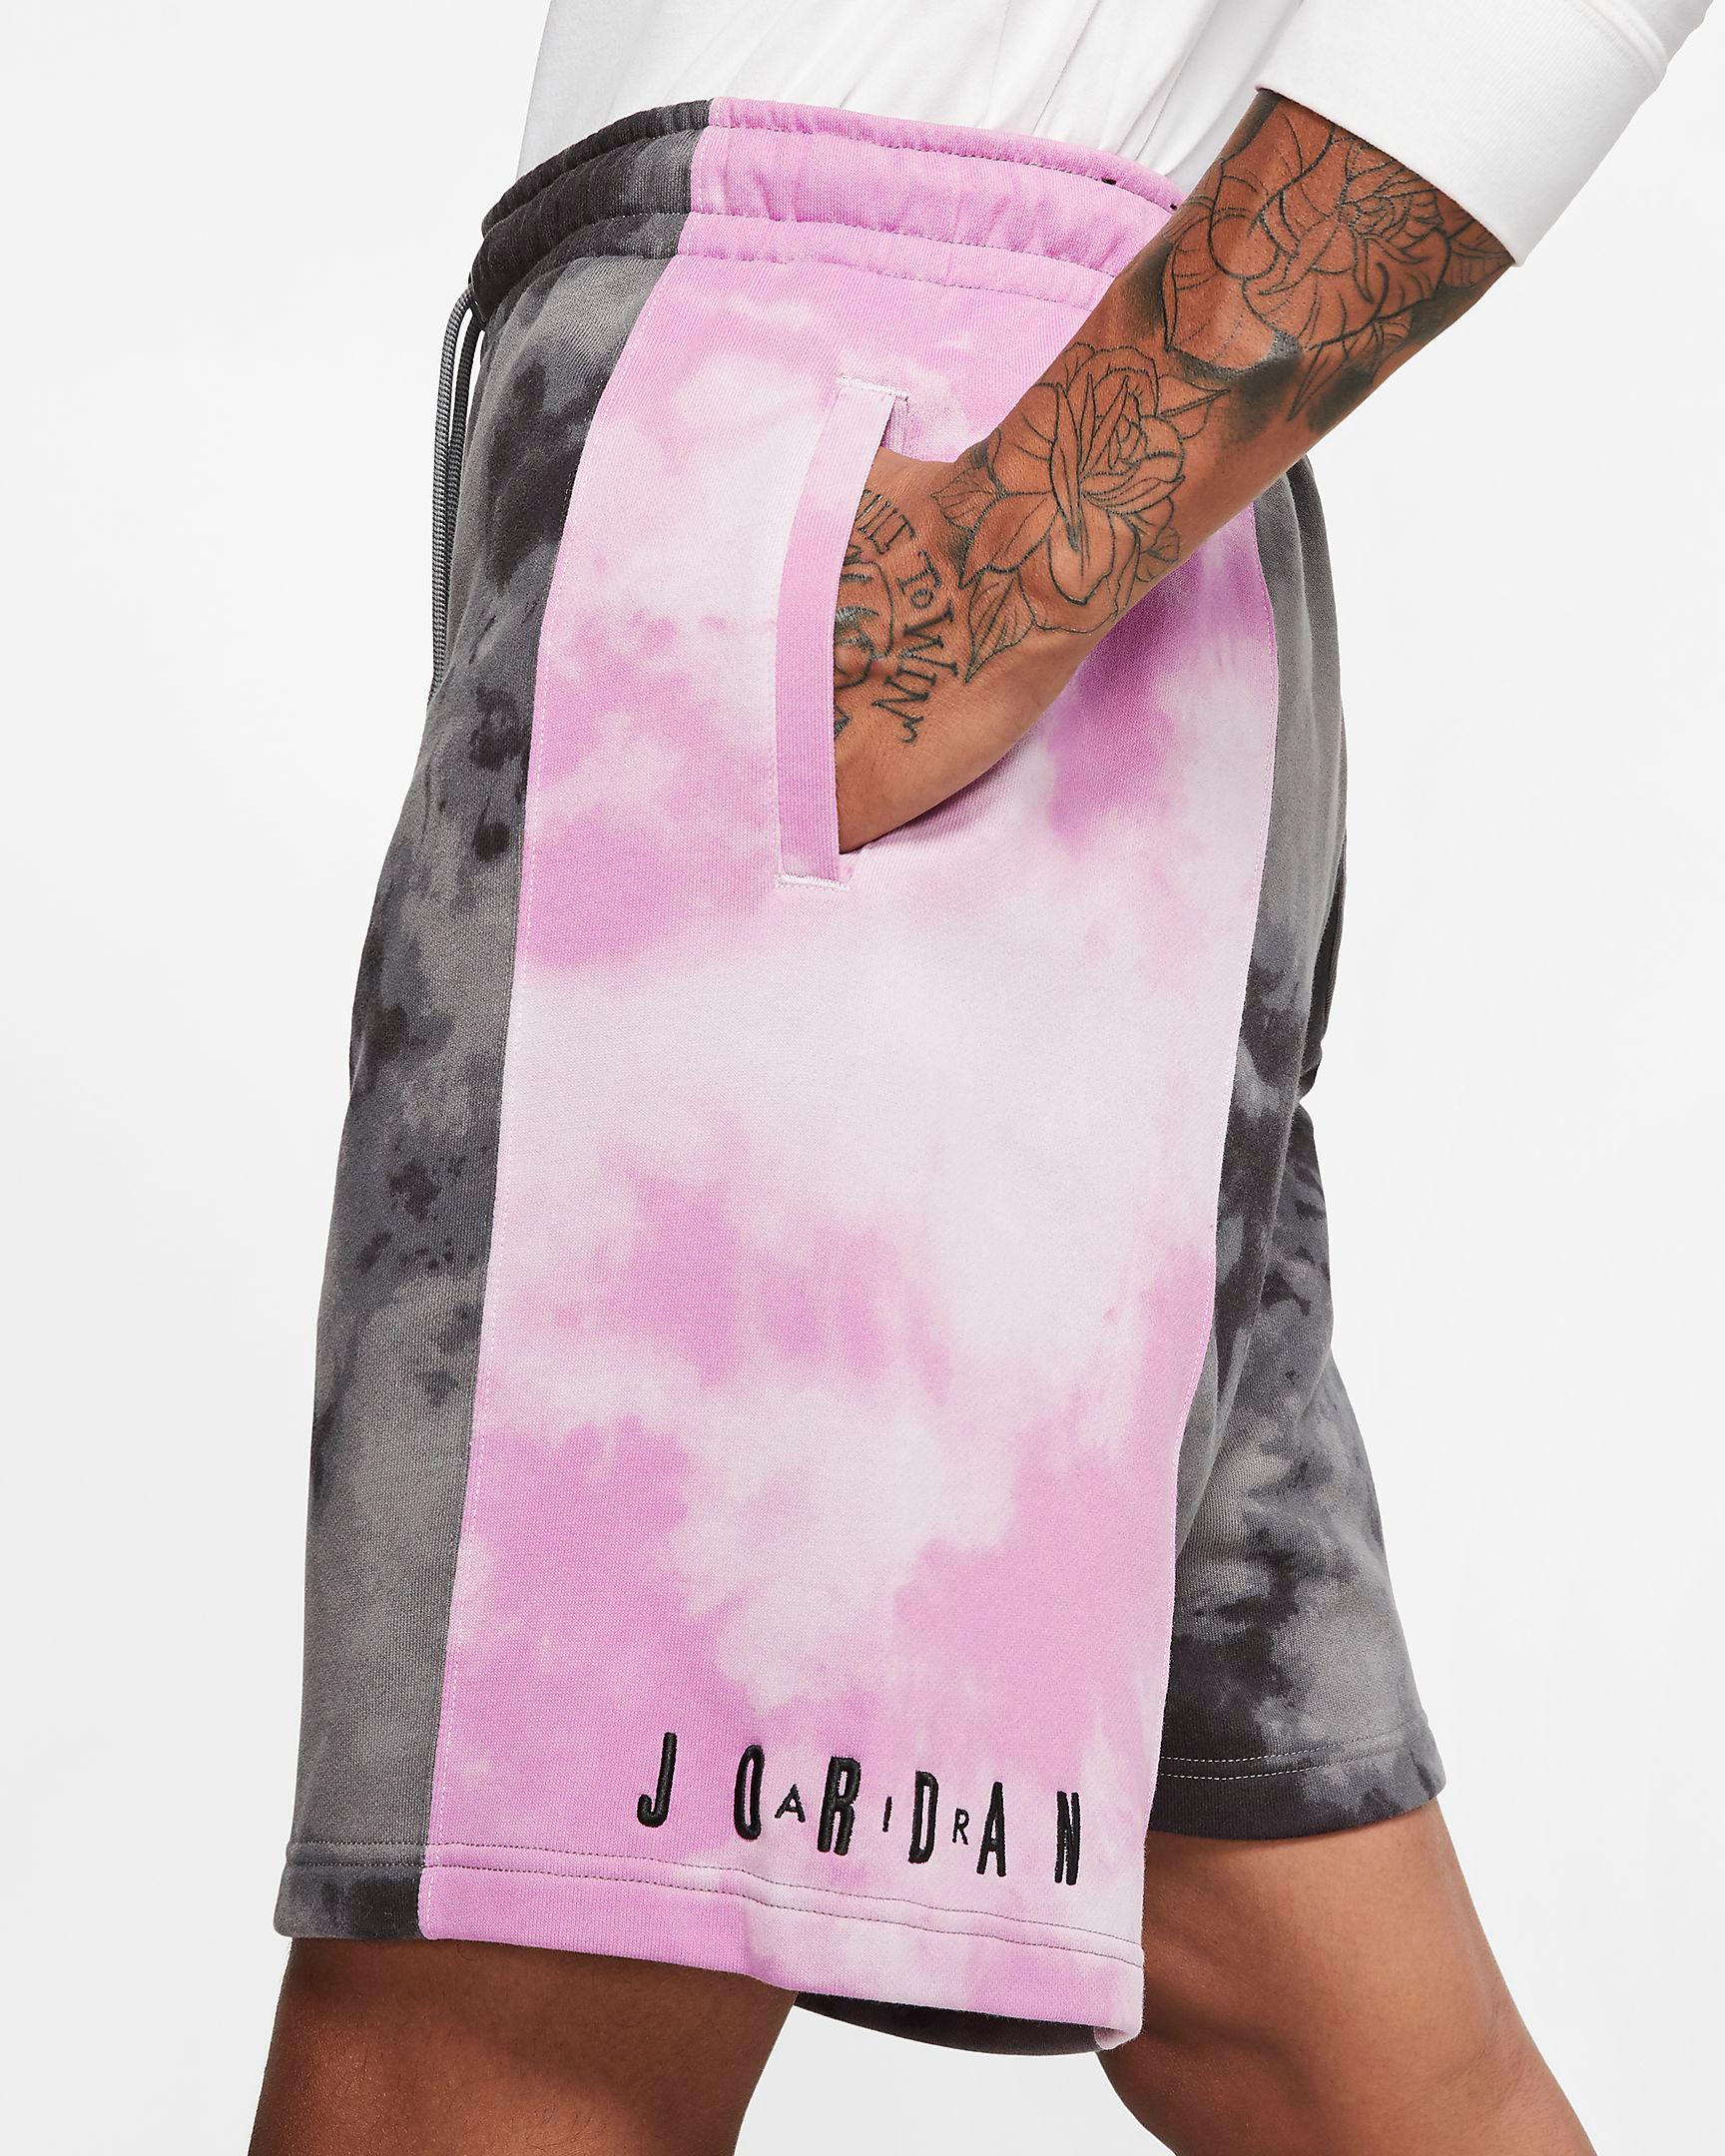 jordan-9-black-smoke-grey-shorts-4